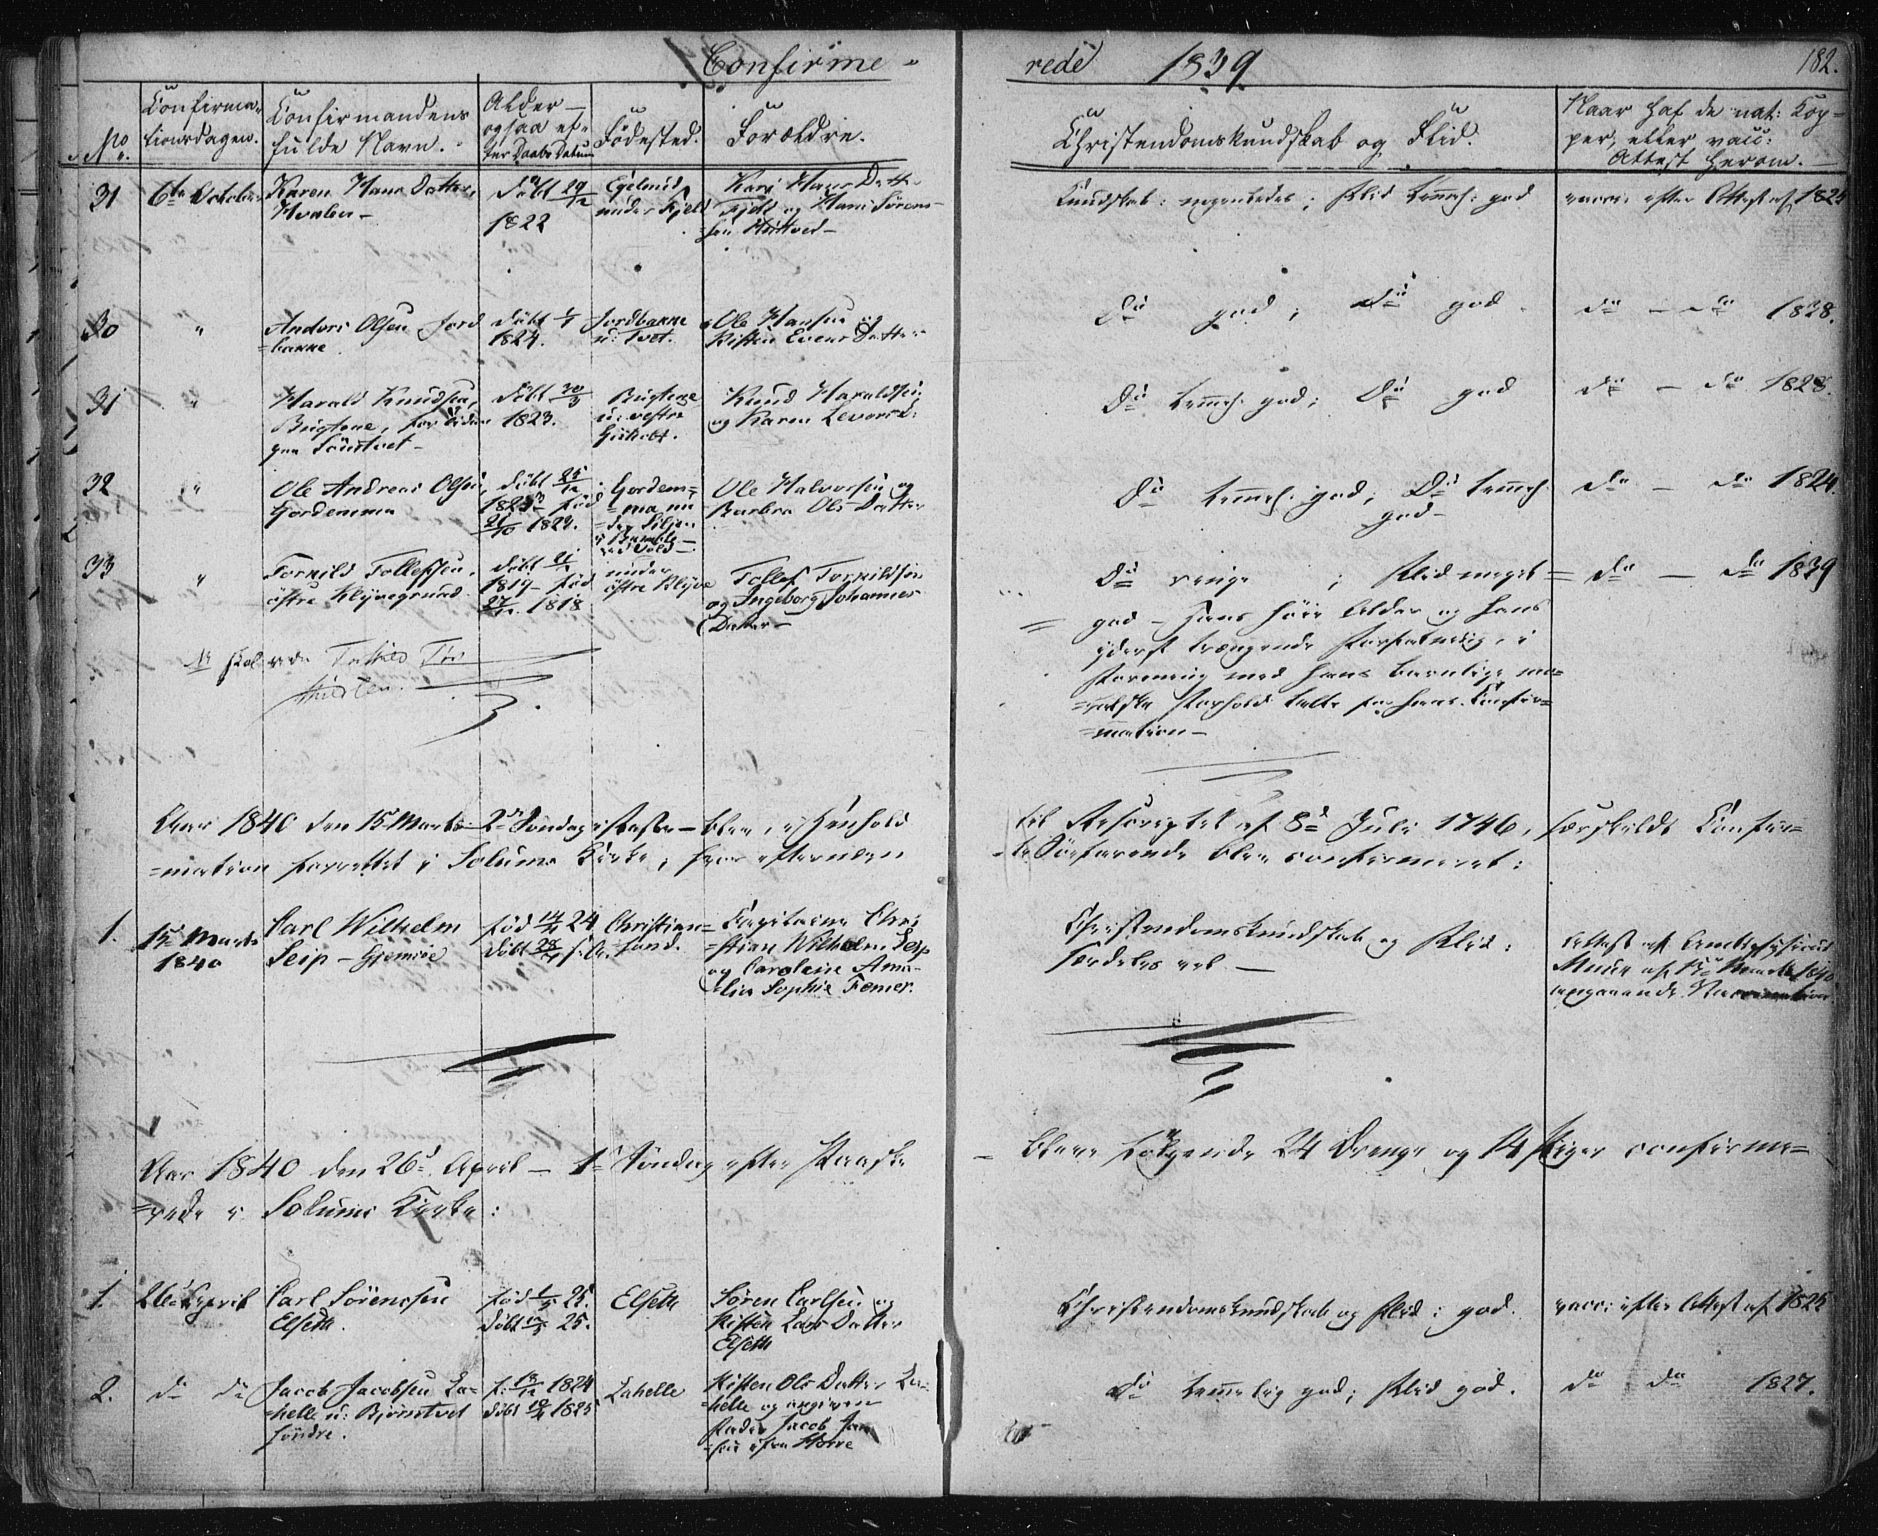 SAKO, Solum kirkebøker, F/Fa/L0005: Ministerialbok nr. I 5, 1833-1843, s. 182